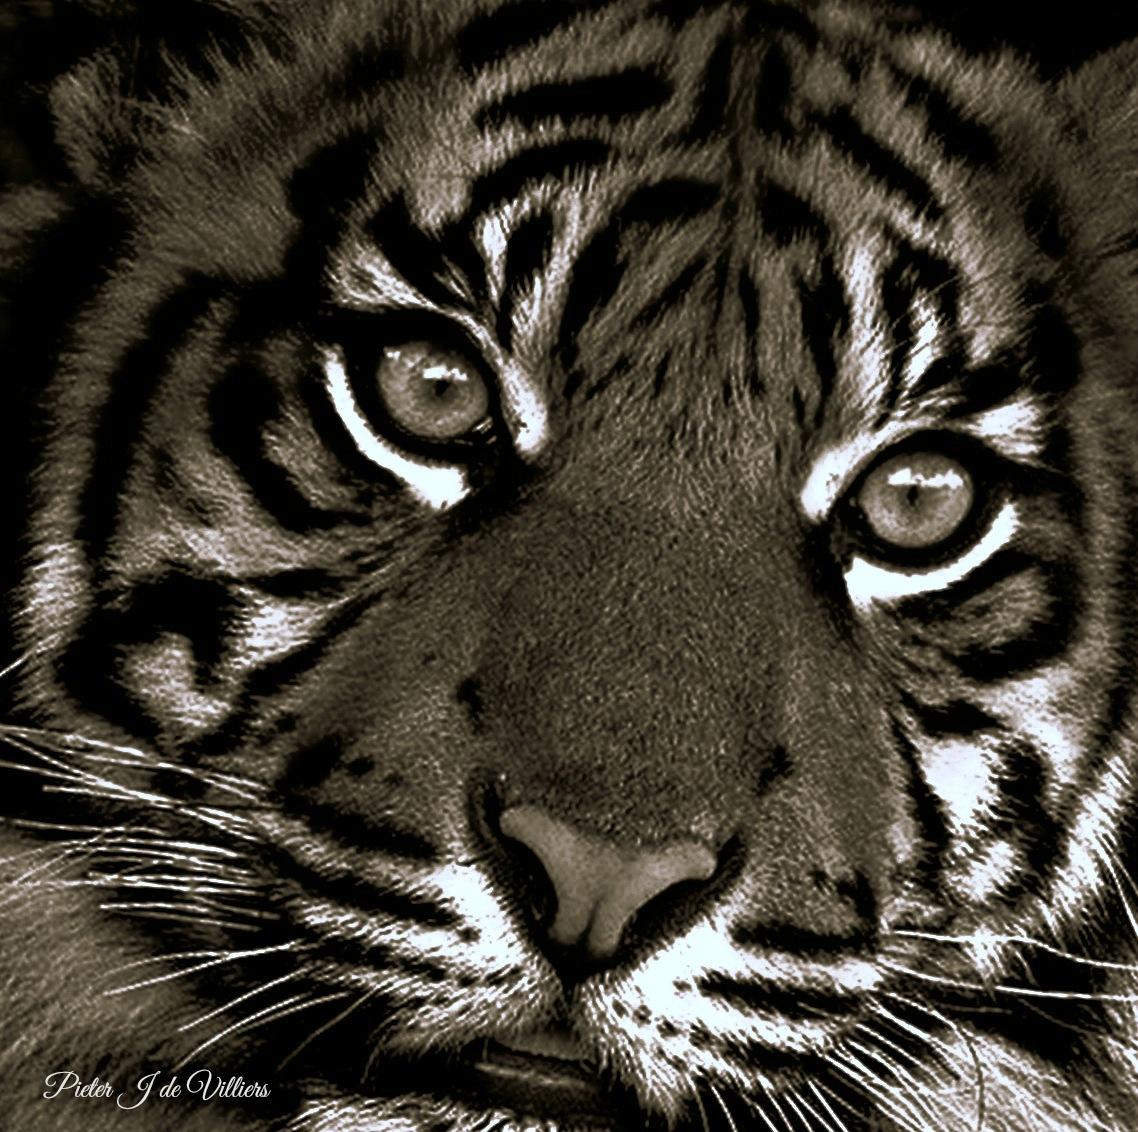 Tiger by Pieter J de Villiers